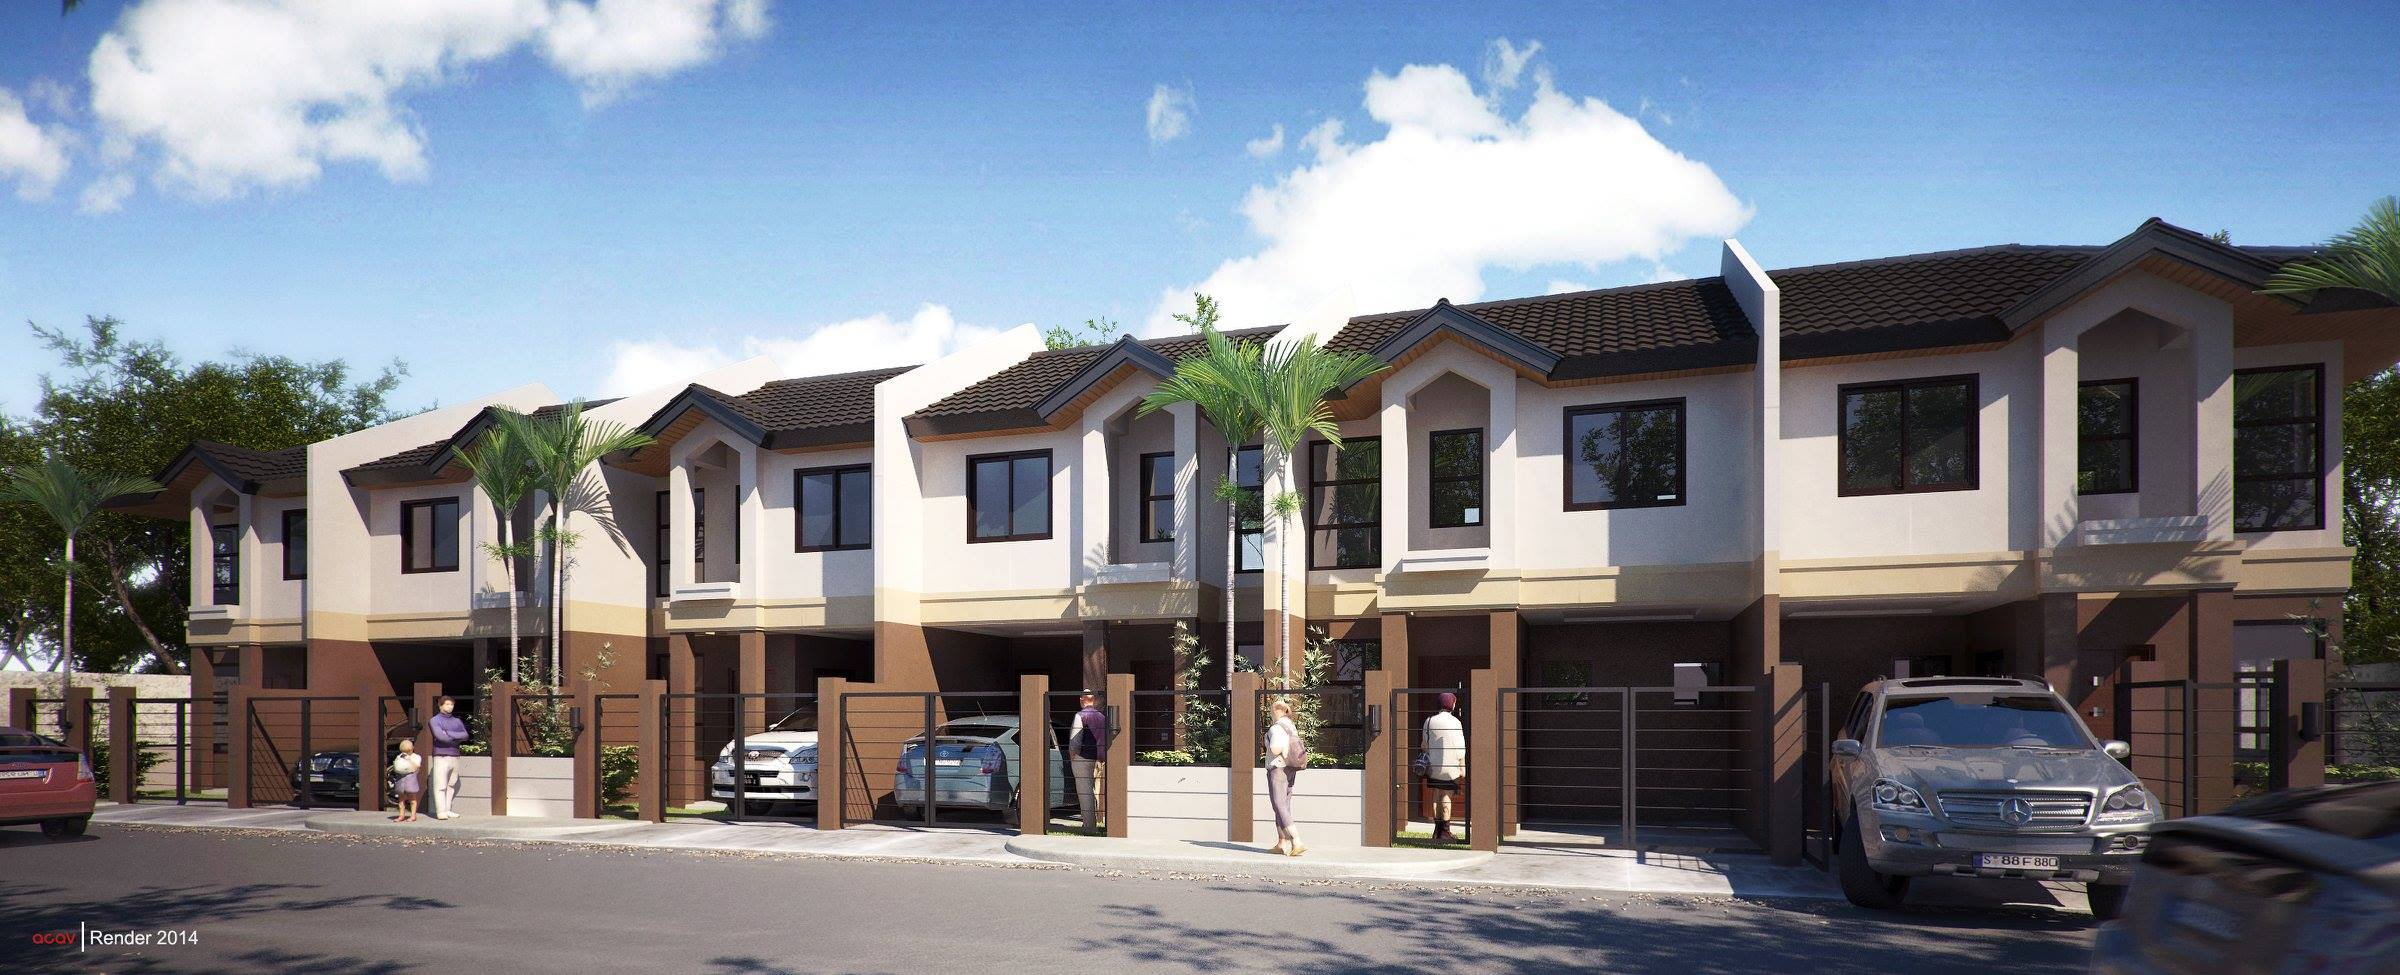 GR130 : Villa Senorita - Jasmine Townhouse, Ma-a, Davao City